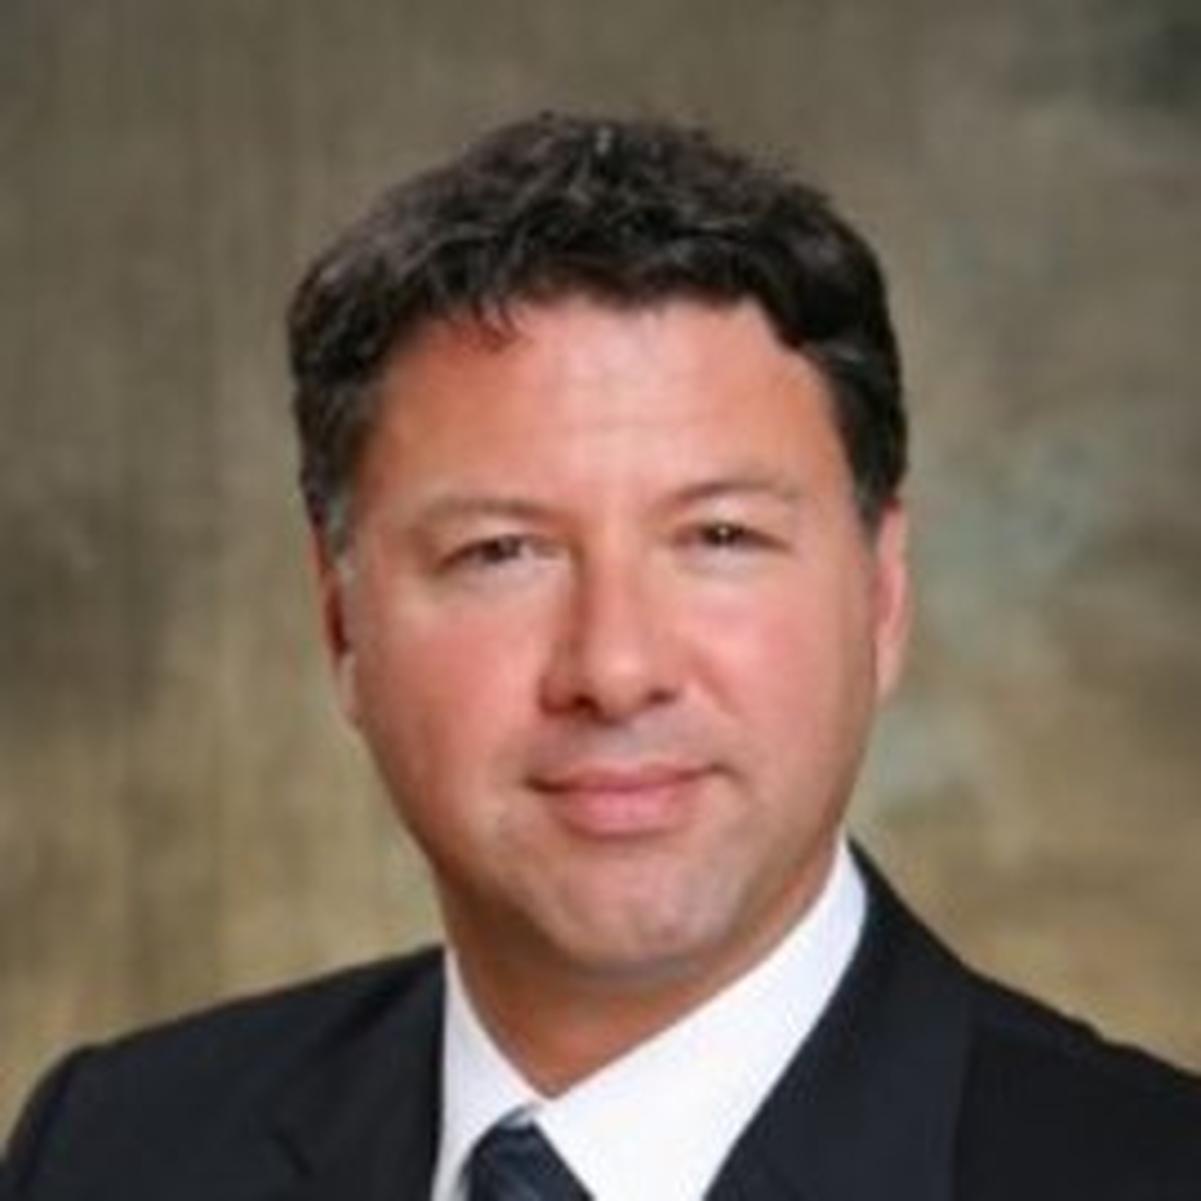 Xavier Unkovic